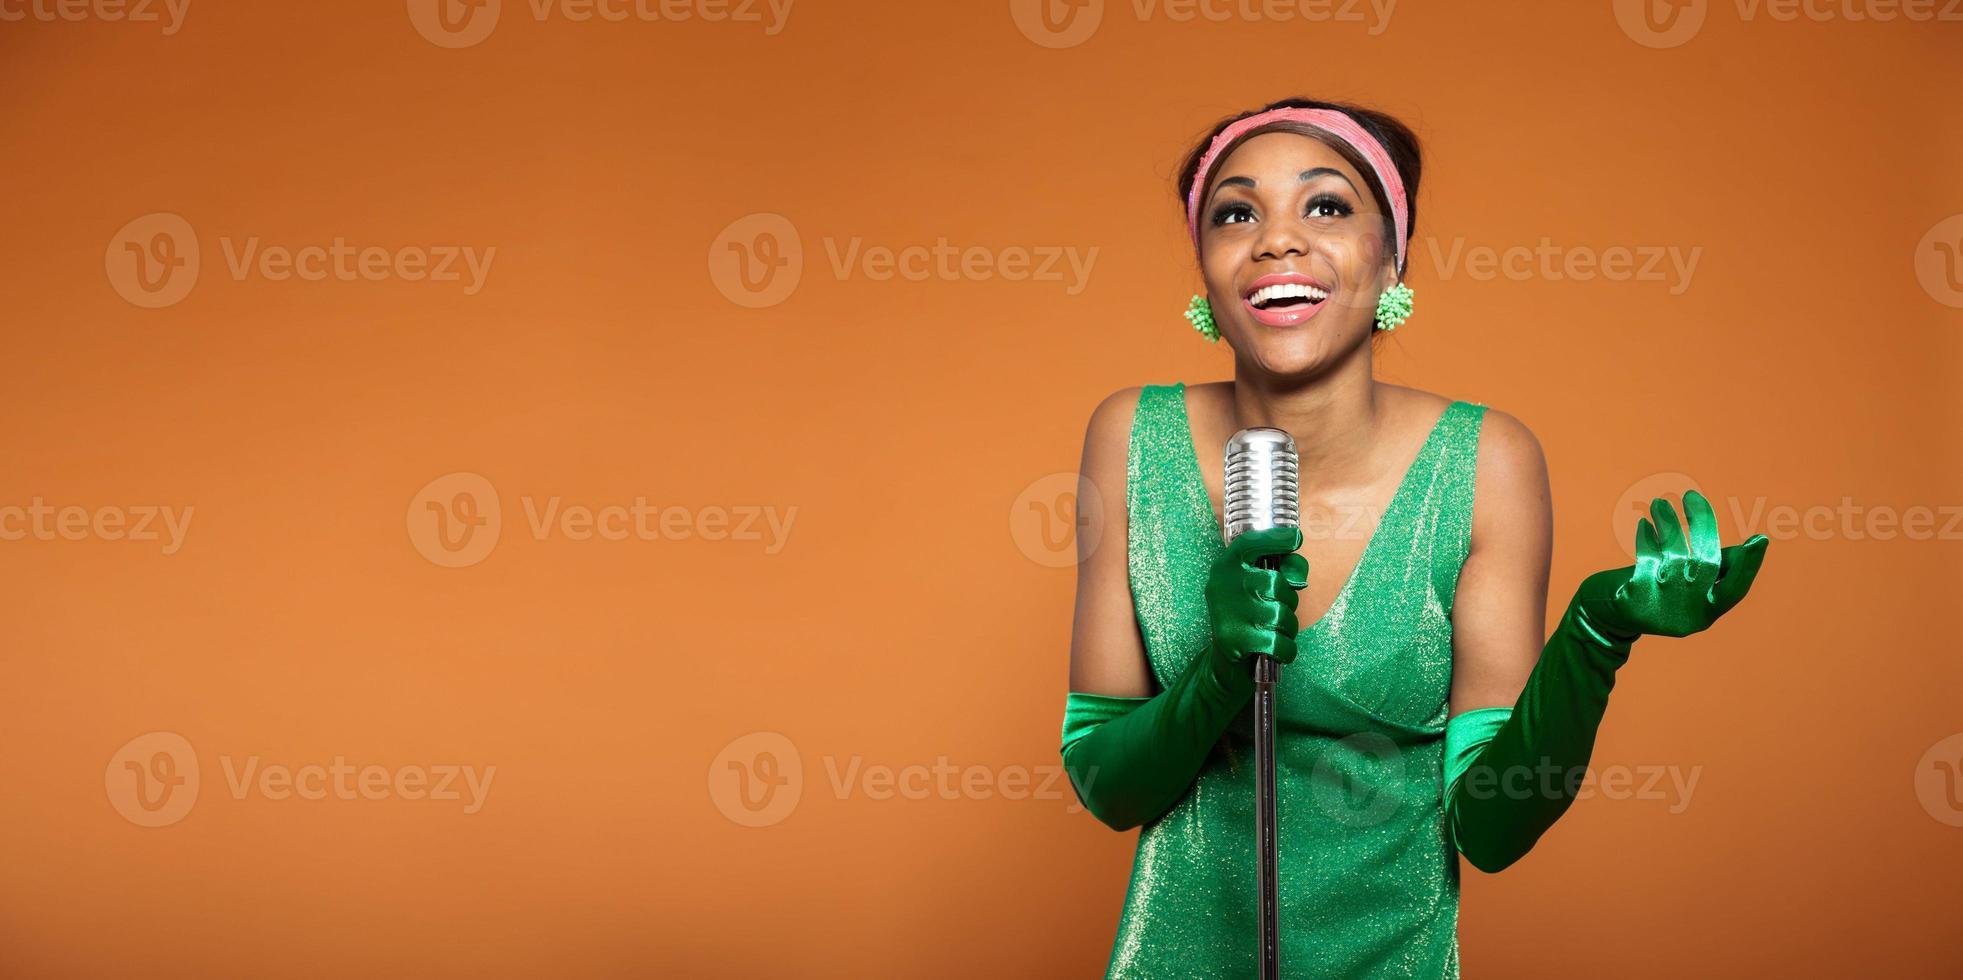 vintage soul jazz kvinna sjunger. svart afrikansk amerikan. kopiera utrymme. foto